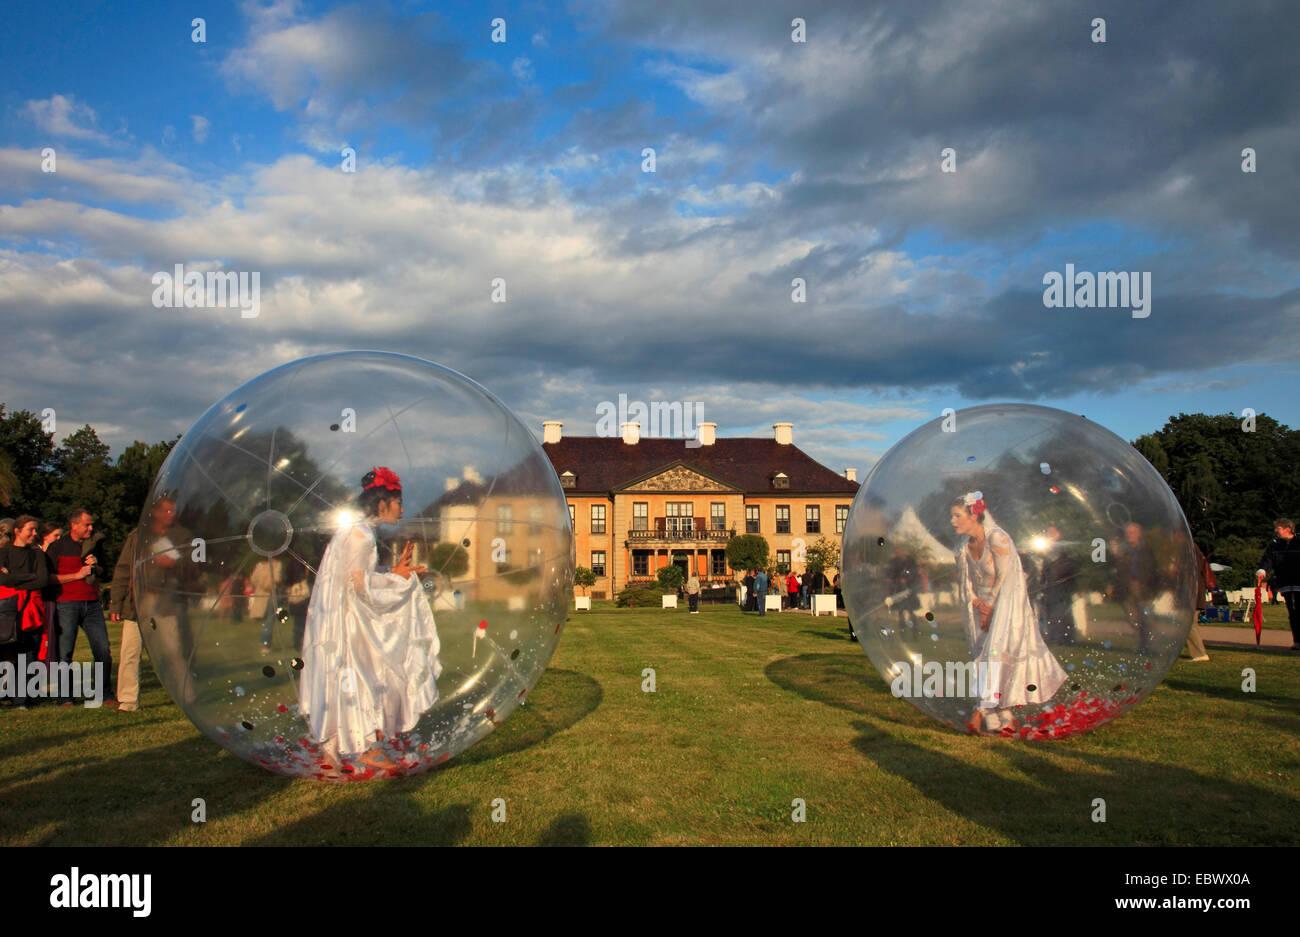 female dancer in lucent balls at festival, Oranienbaum Palace, Germany, Saxony-Anhalt, Oranienbaum - Stock Image